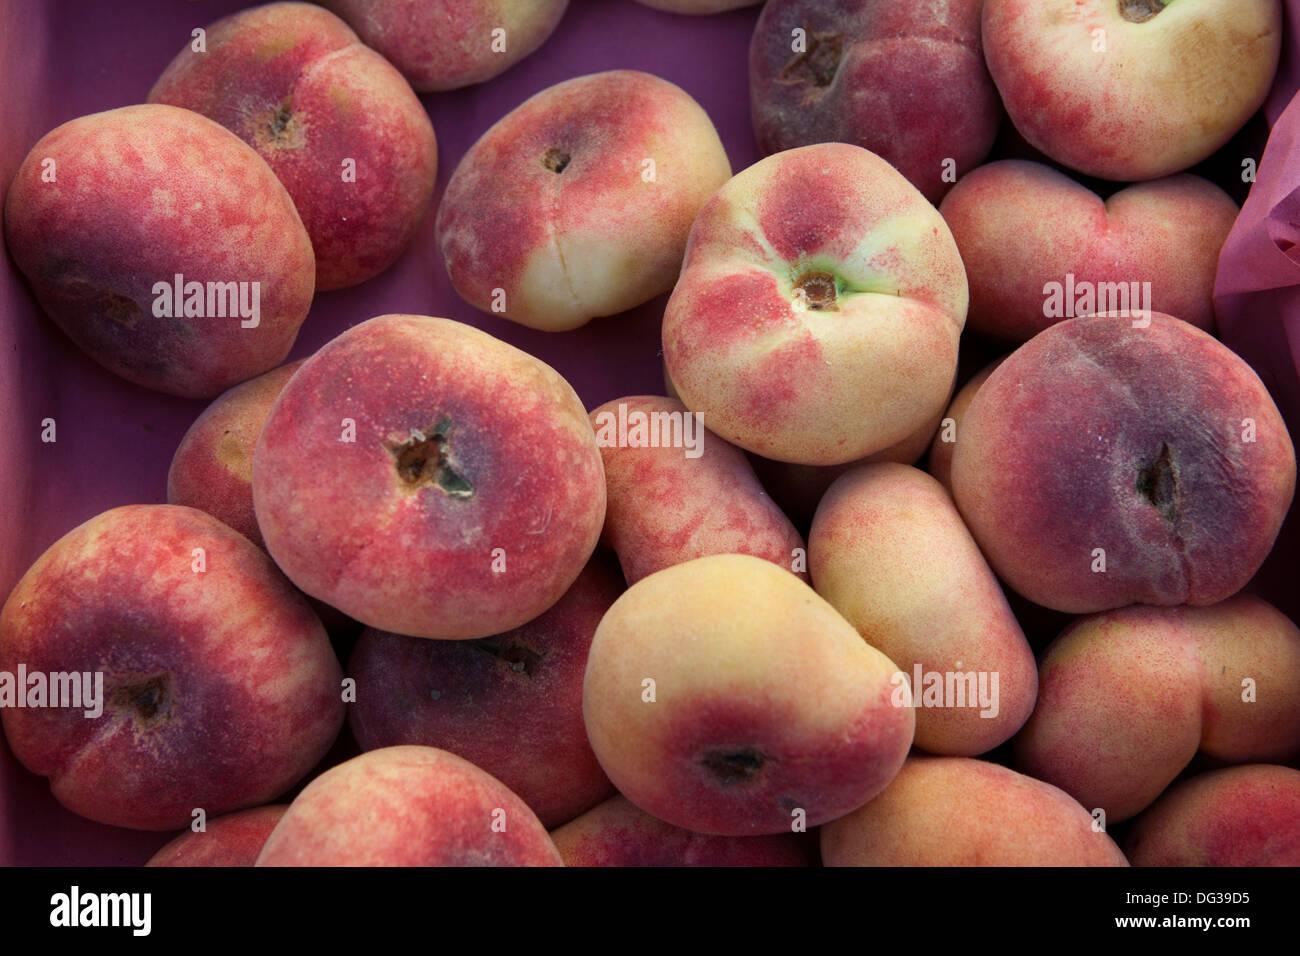 Prunus persica var platycarpa